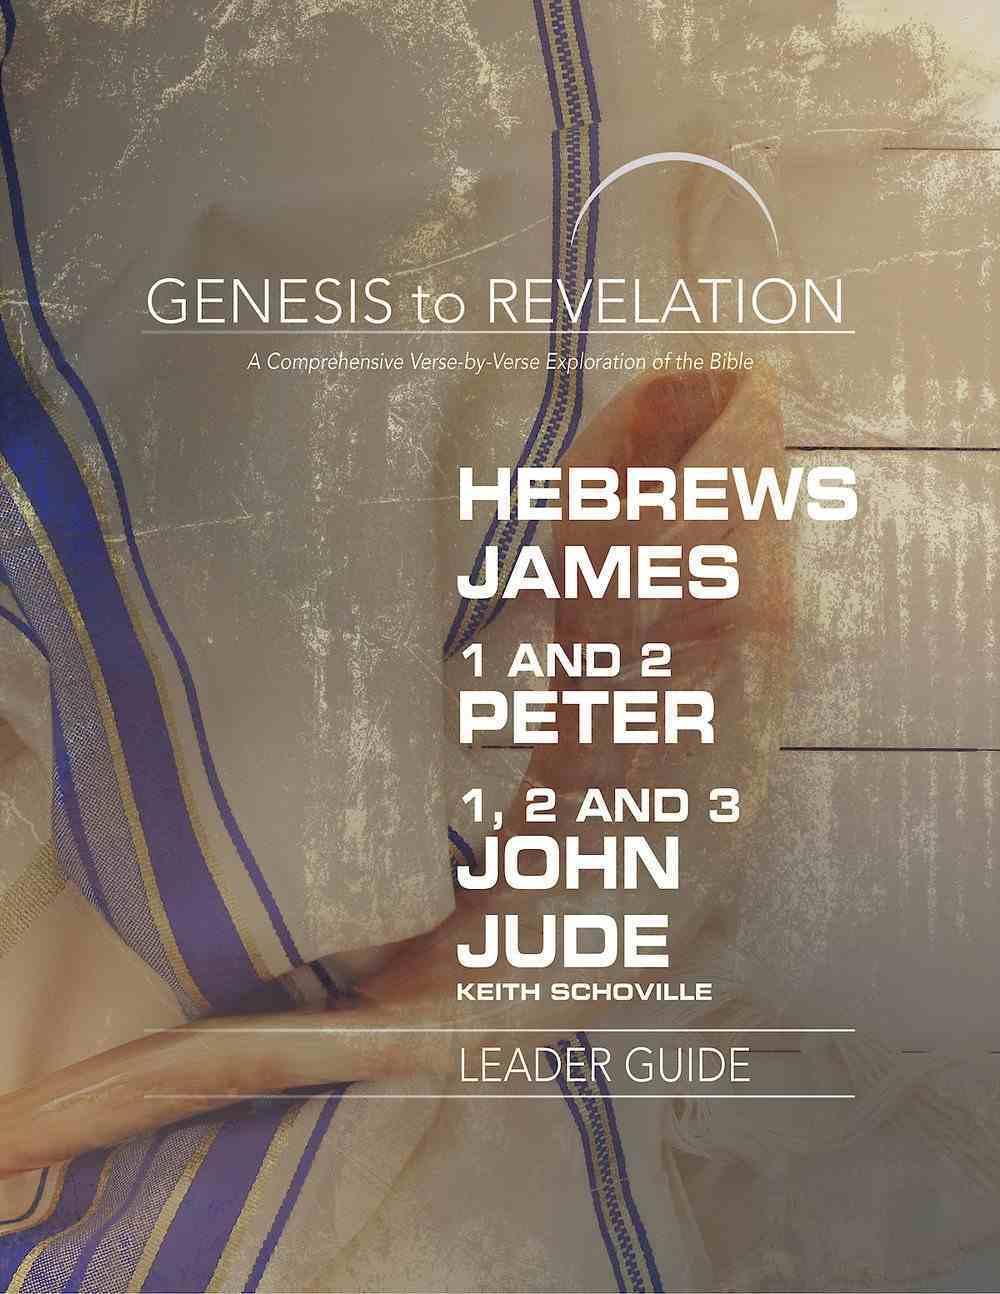 Hebrews, James, 1&2 Peter, 1,2,3 John, Jude : A Comprehensive Verse-By-Verse Exploration of the Bible (Leader Guide) (Genesis To Revelation Series) eBook